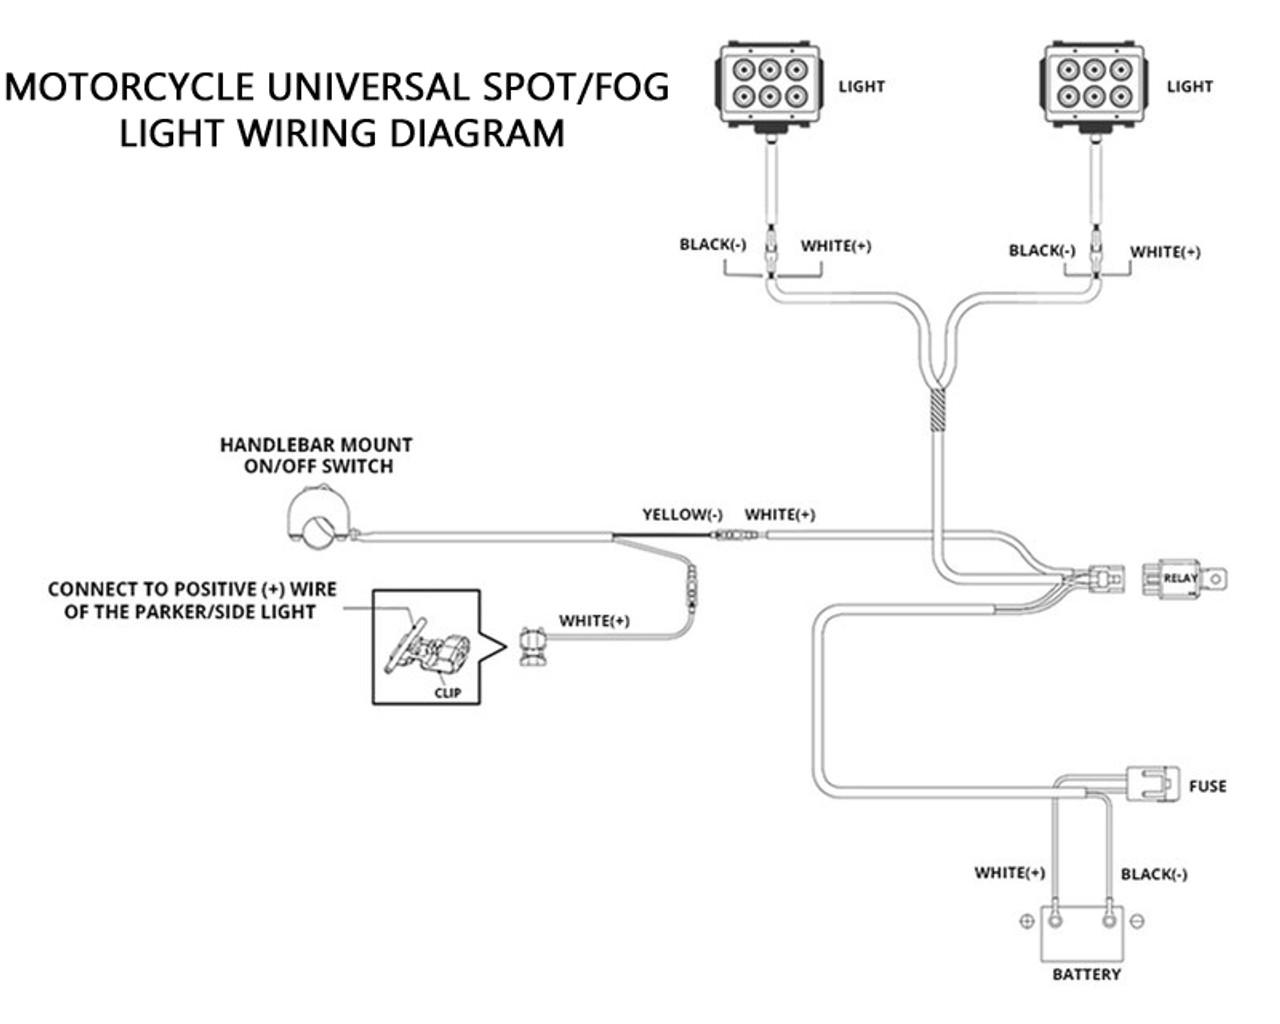 Motorcycle Lights Wiring Diagram